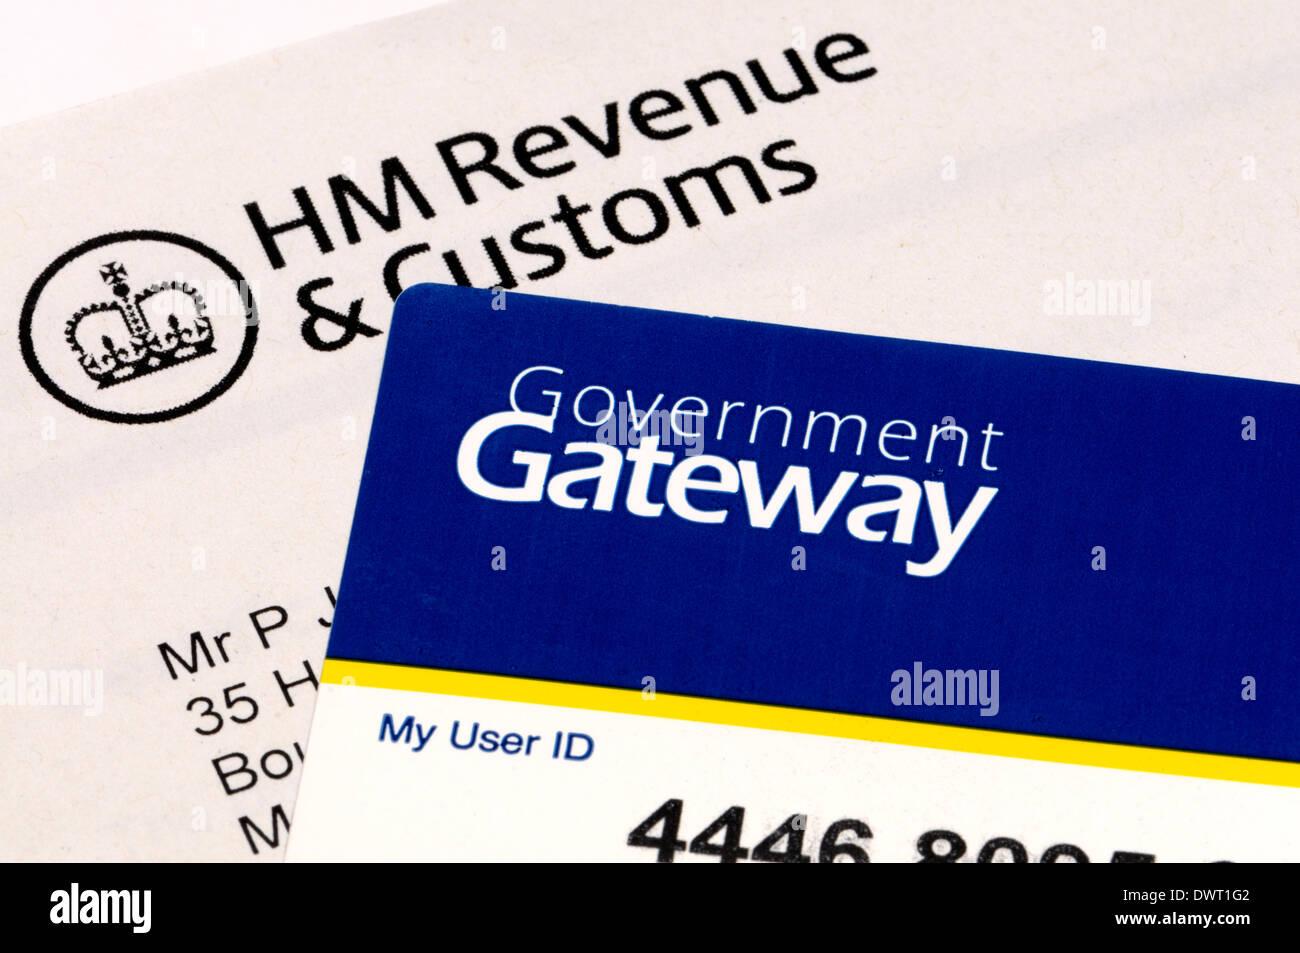 British tax - HM Customs and Revenue Government Gateway ...